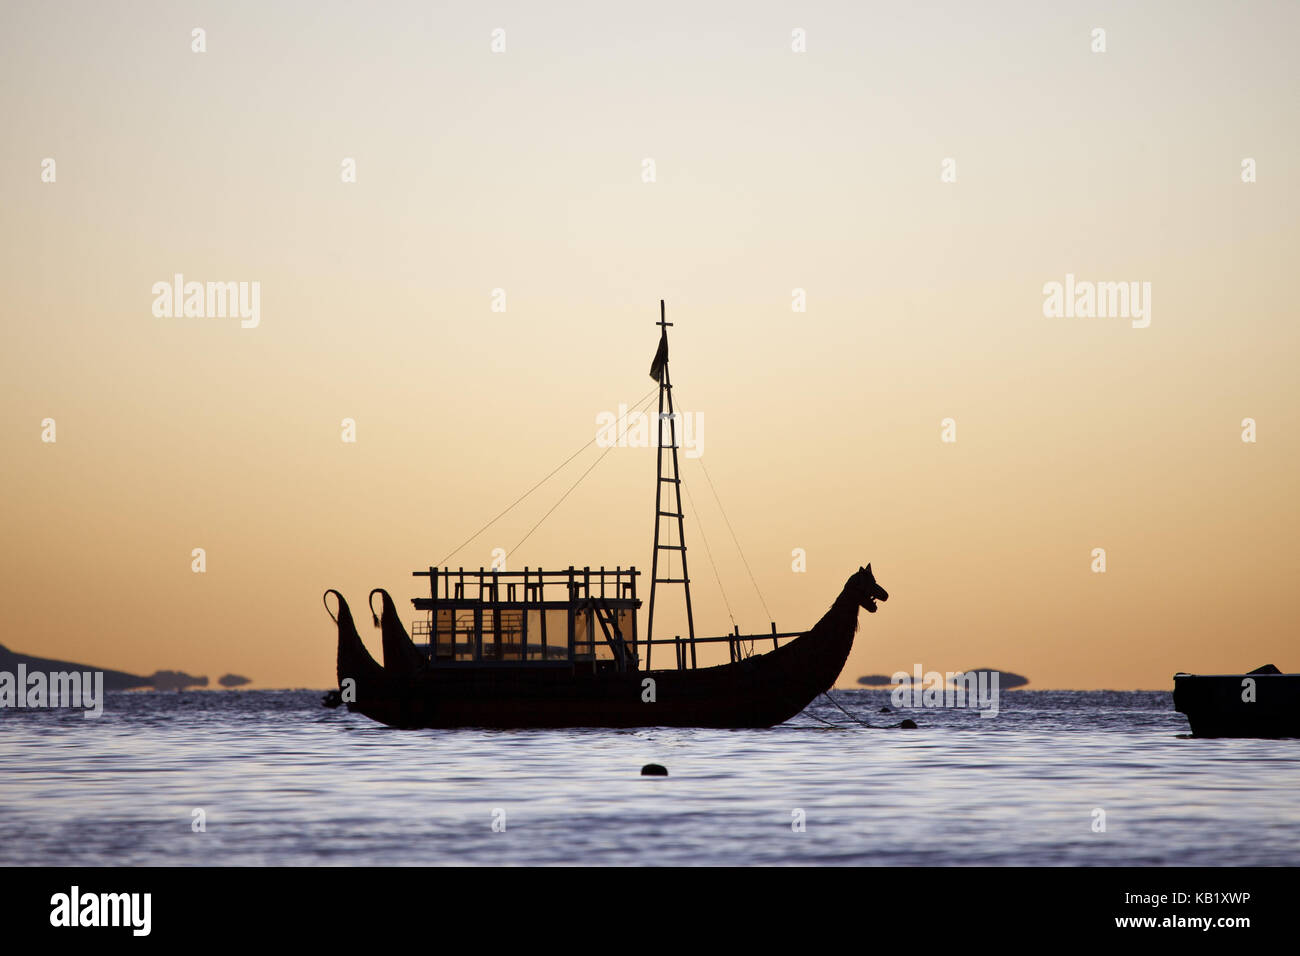 Bolivia, Titicacasee, Copacabana, sundown, reed Boat, - Stock Image